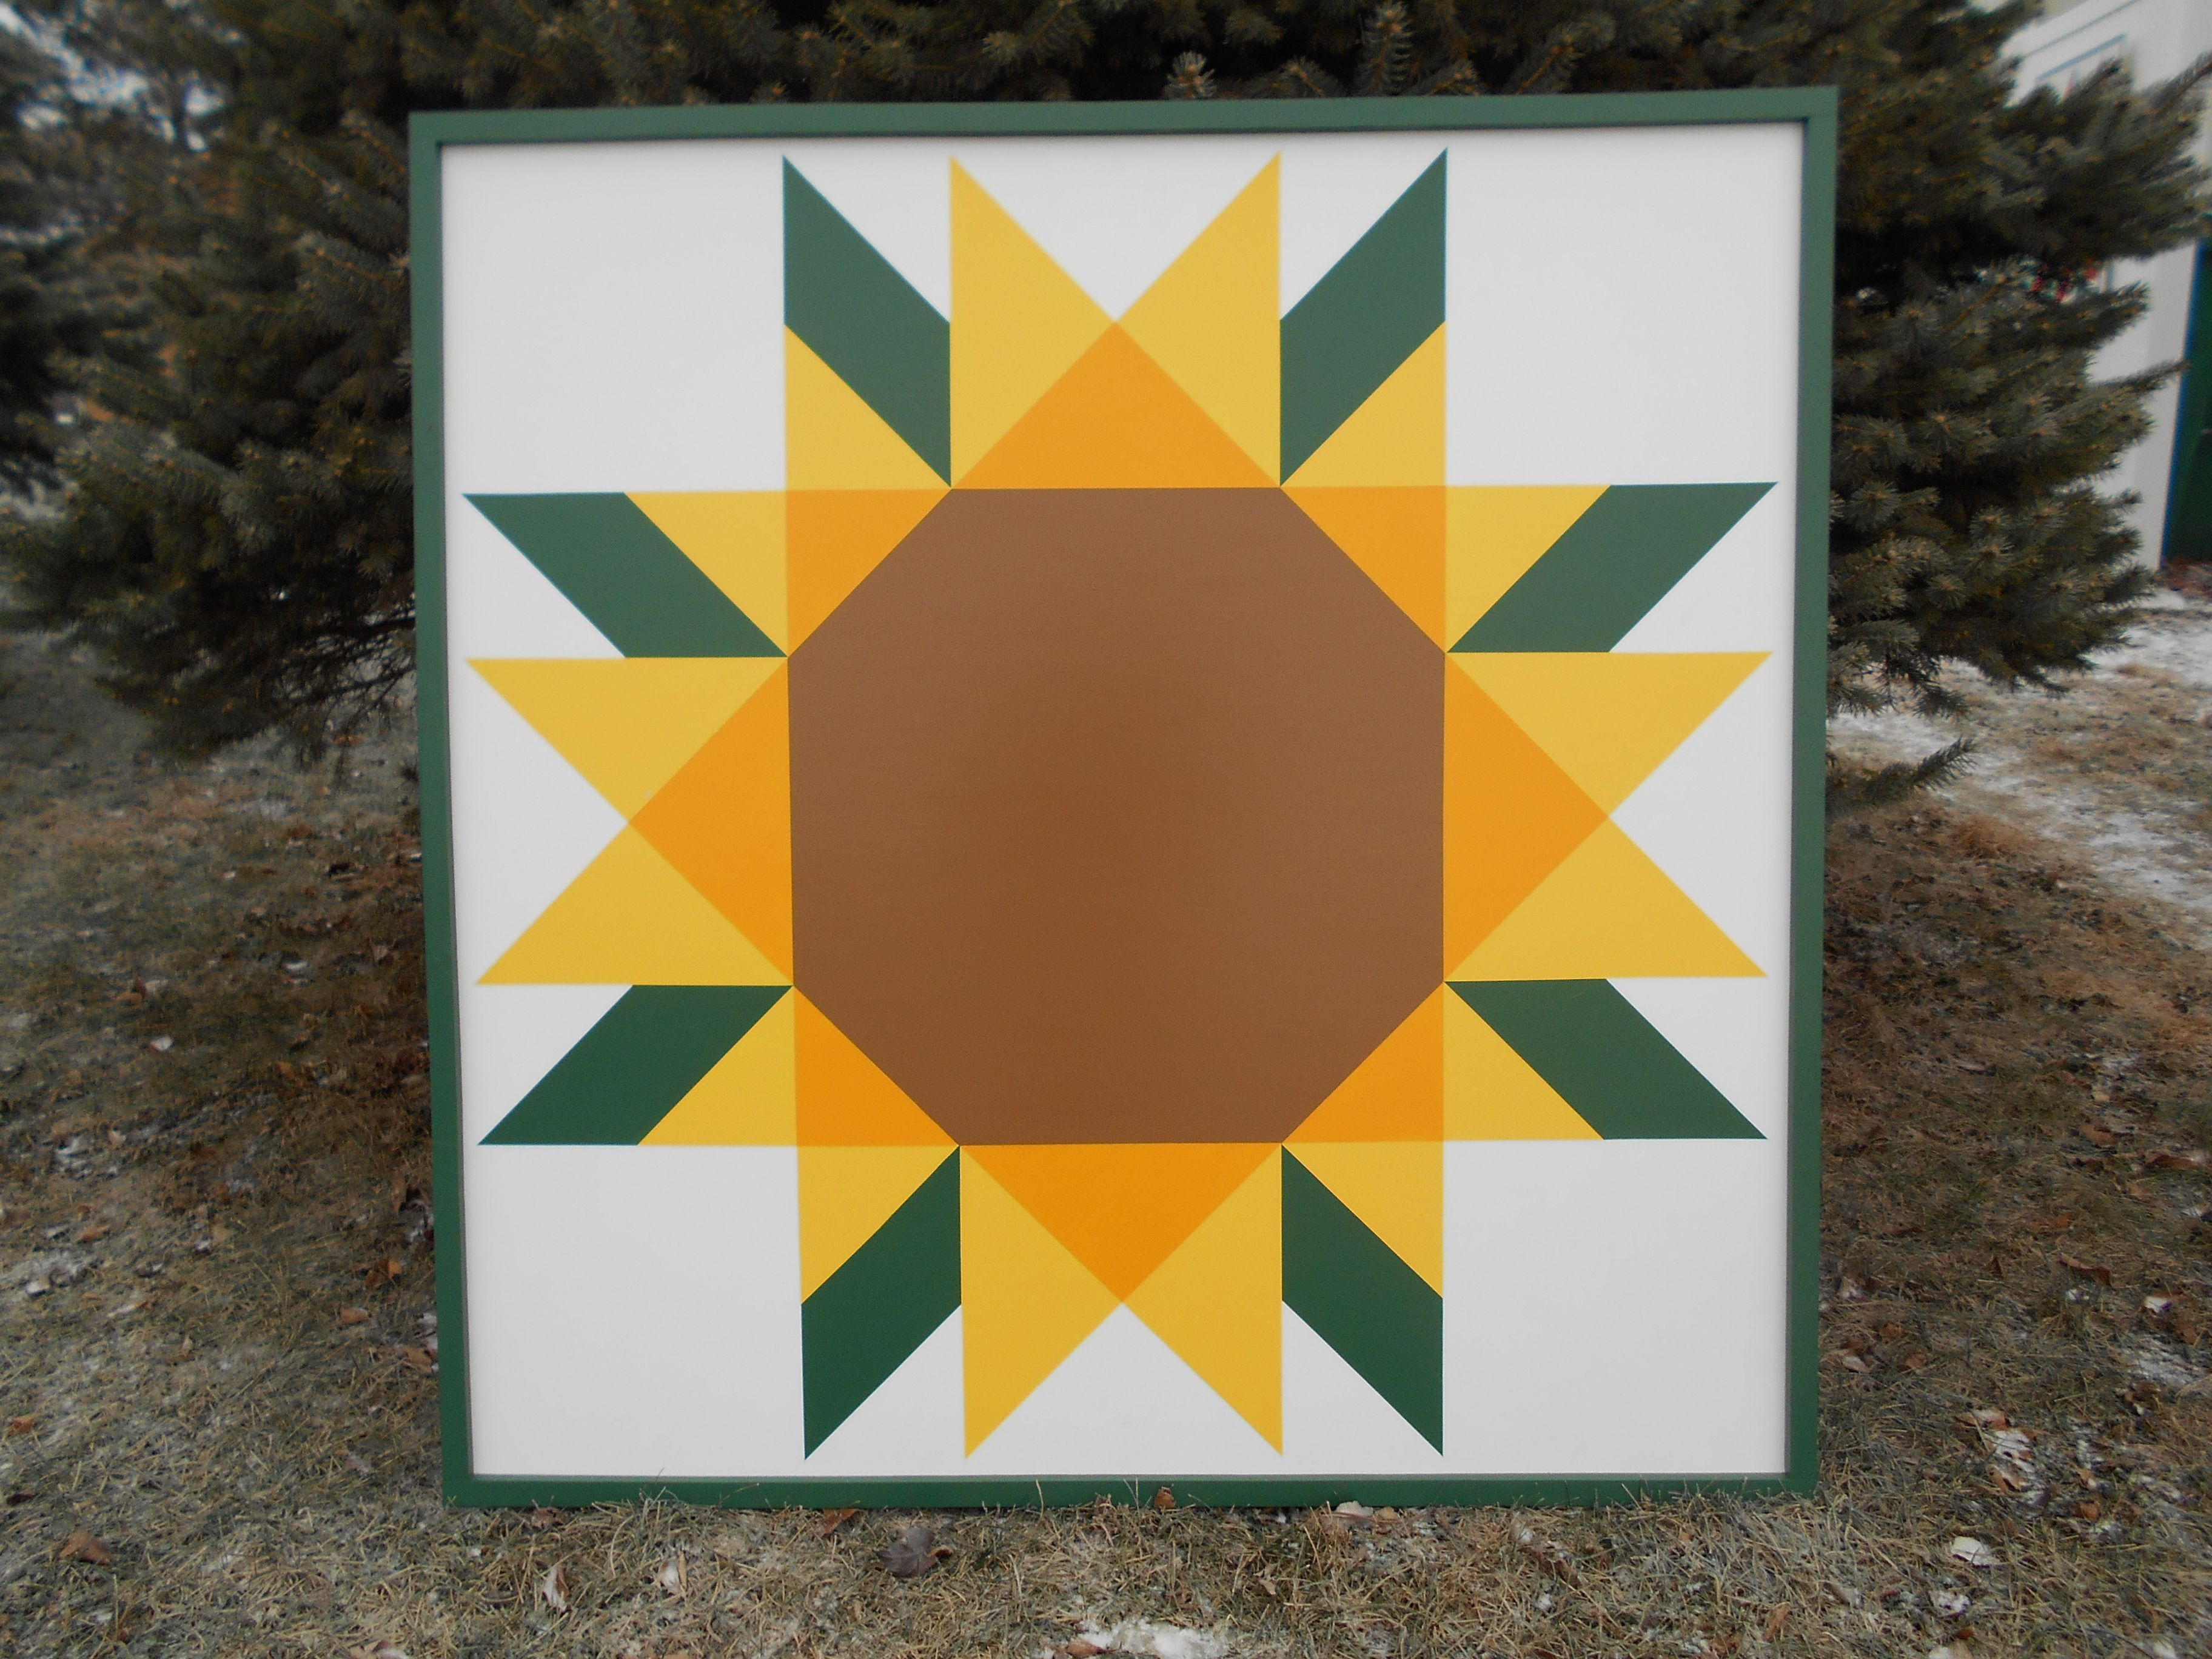 Best 25+ Barn quilt designs ideas on Pinterest   Barn quilt ... : quilt patterns on barns - Adamdwight.com